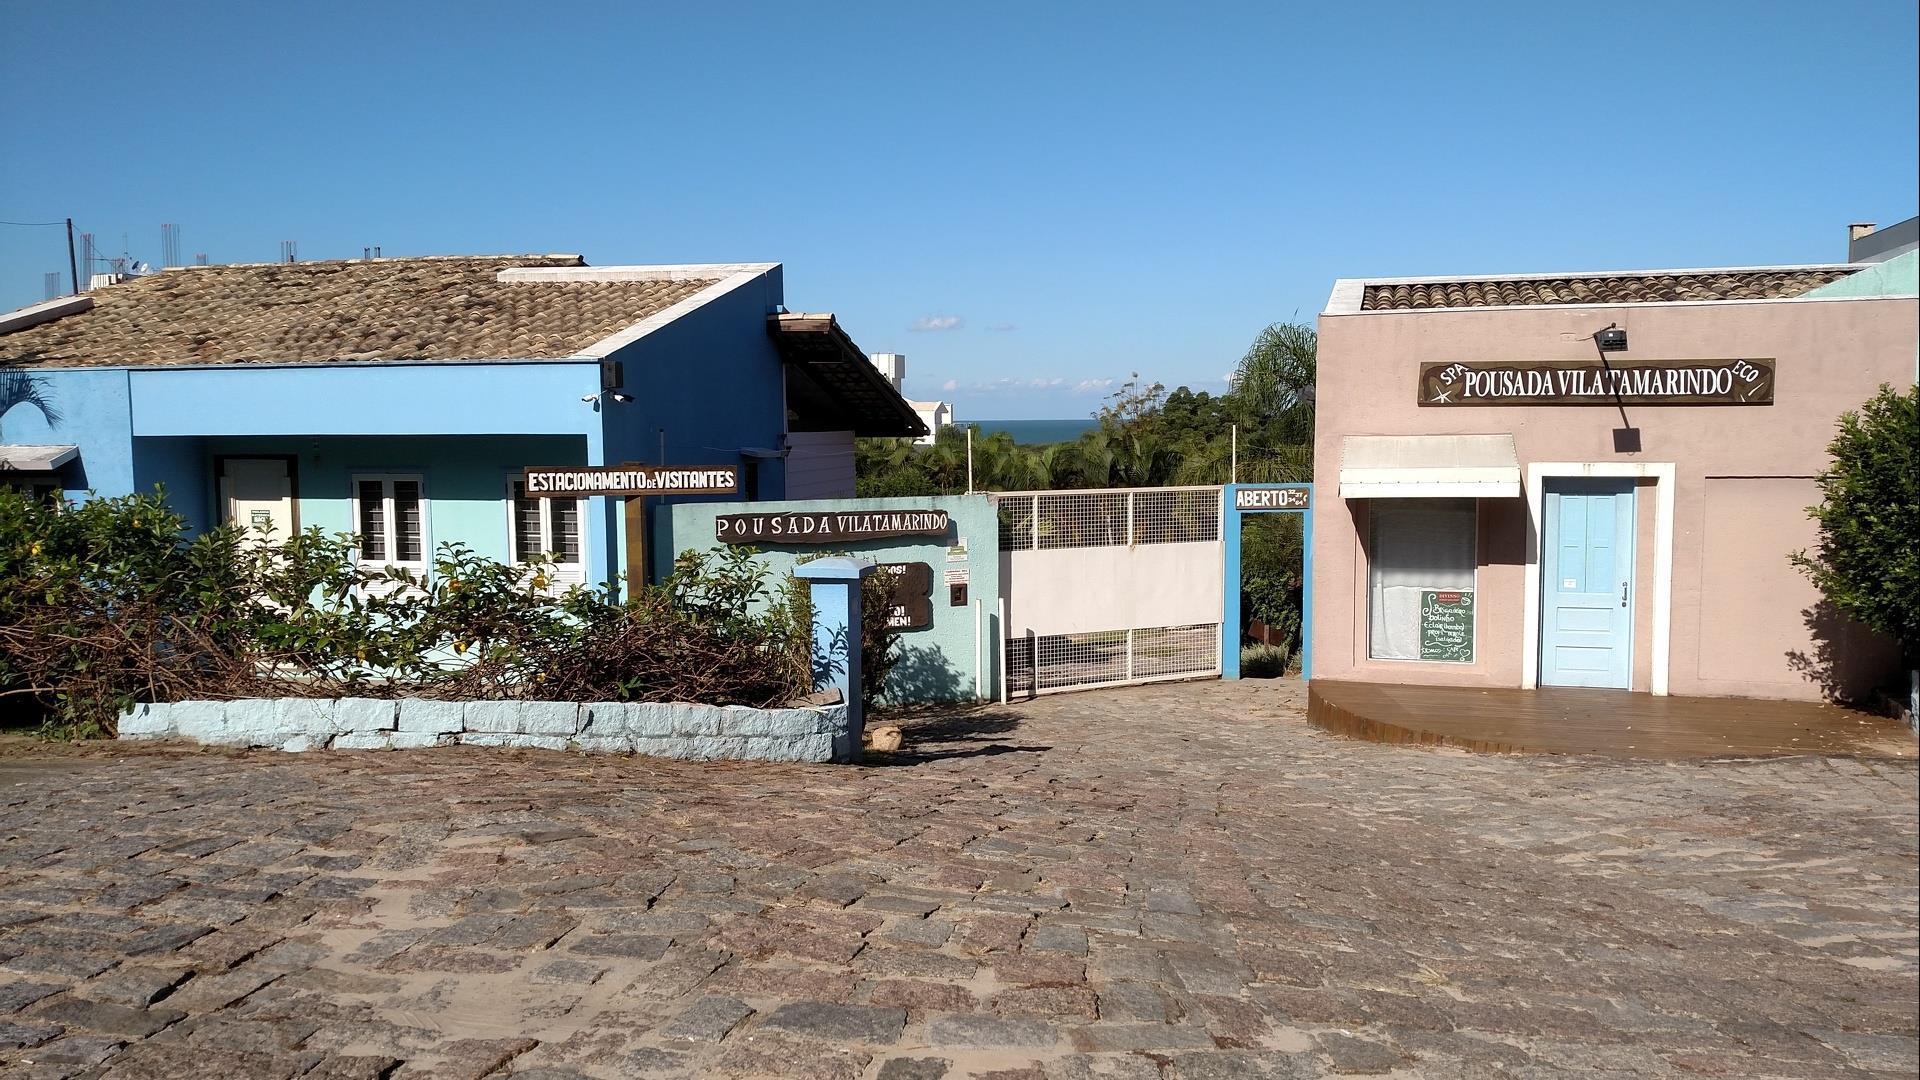 Brasilien Florianopolis: Landestypische Unterkunft - Pousada Vila Tamarindo Eco Lodge